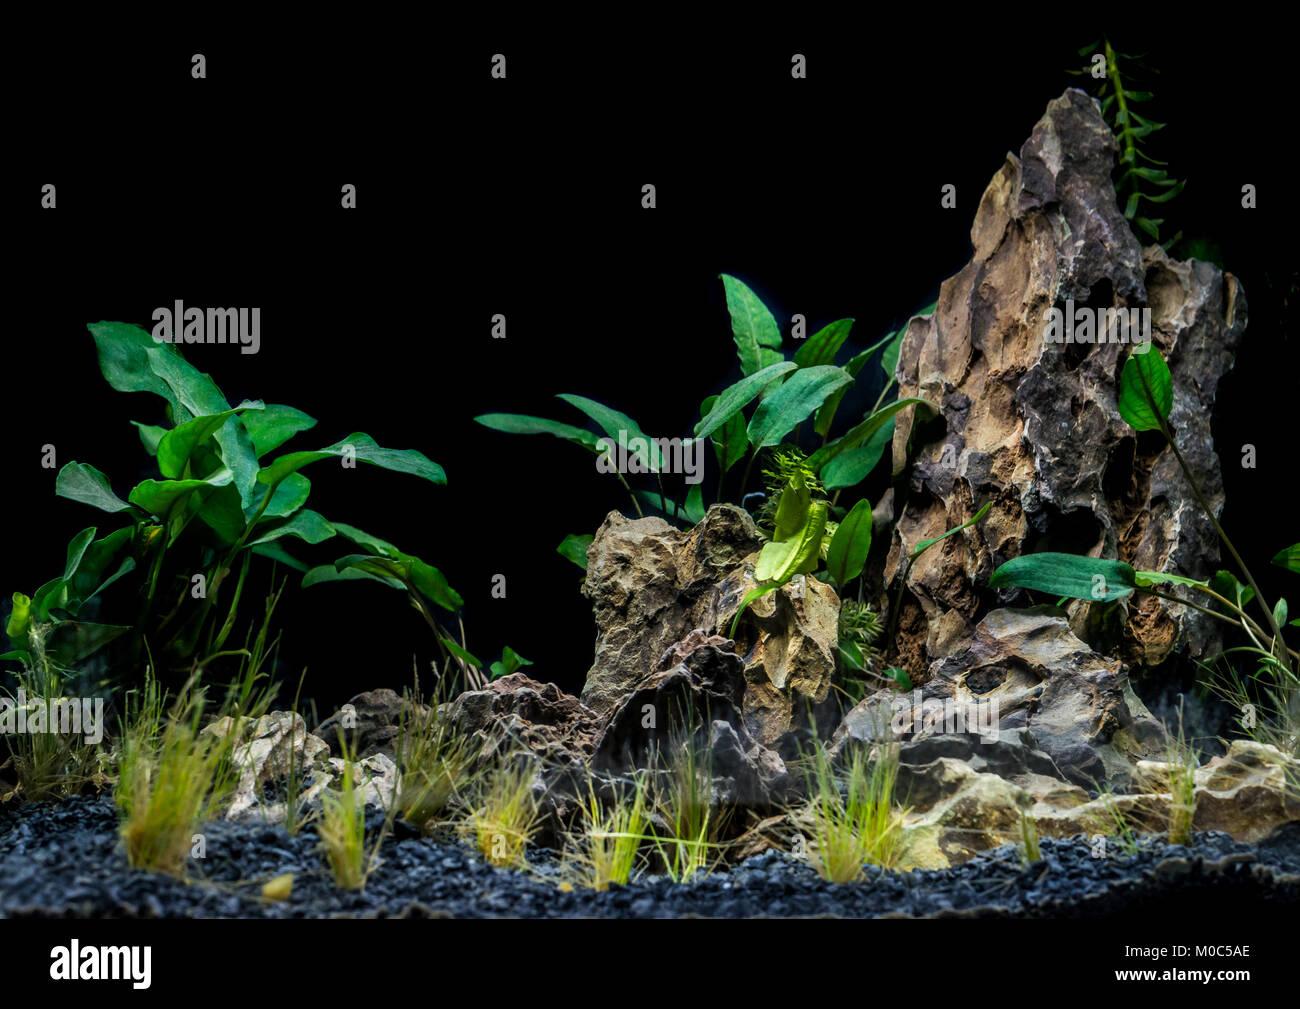 A Shot Of The Fluval Flex 57 Aquascape Stock Photo Alamy